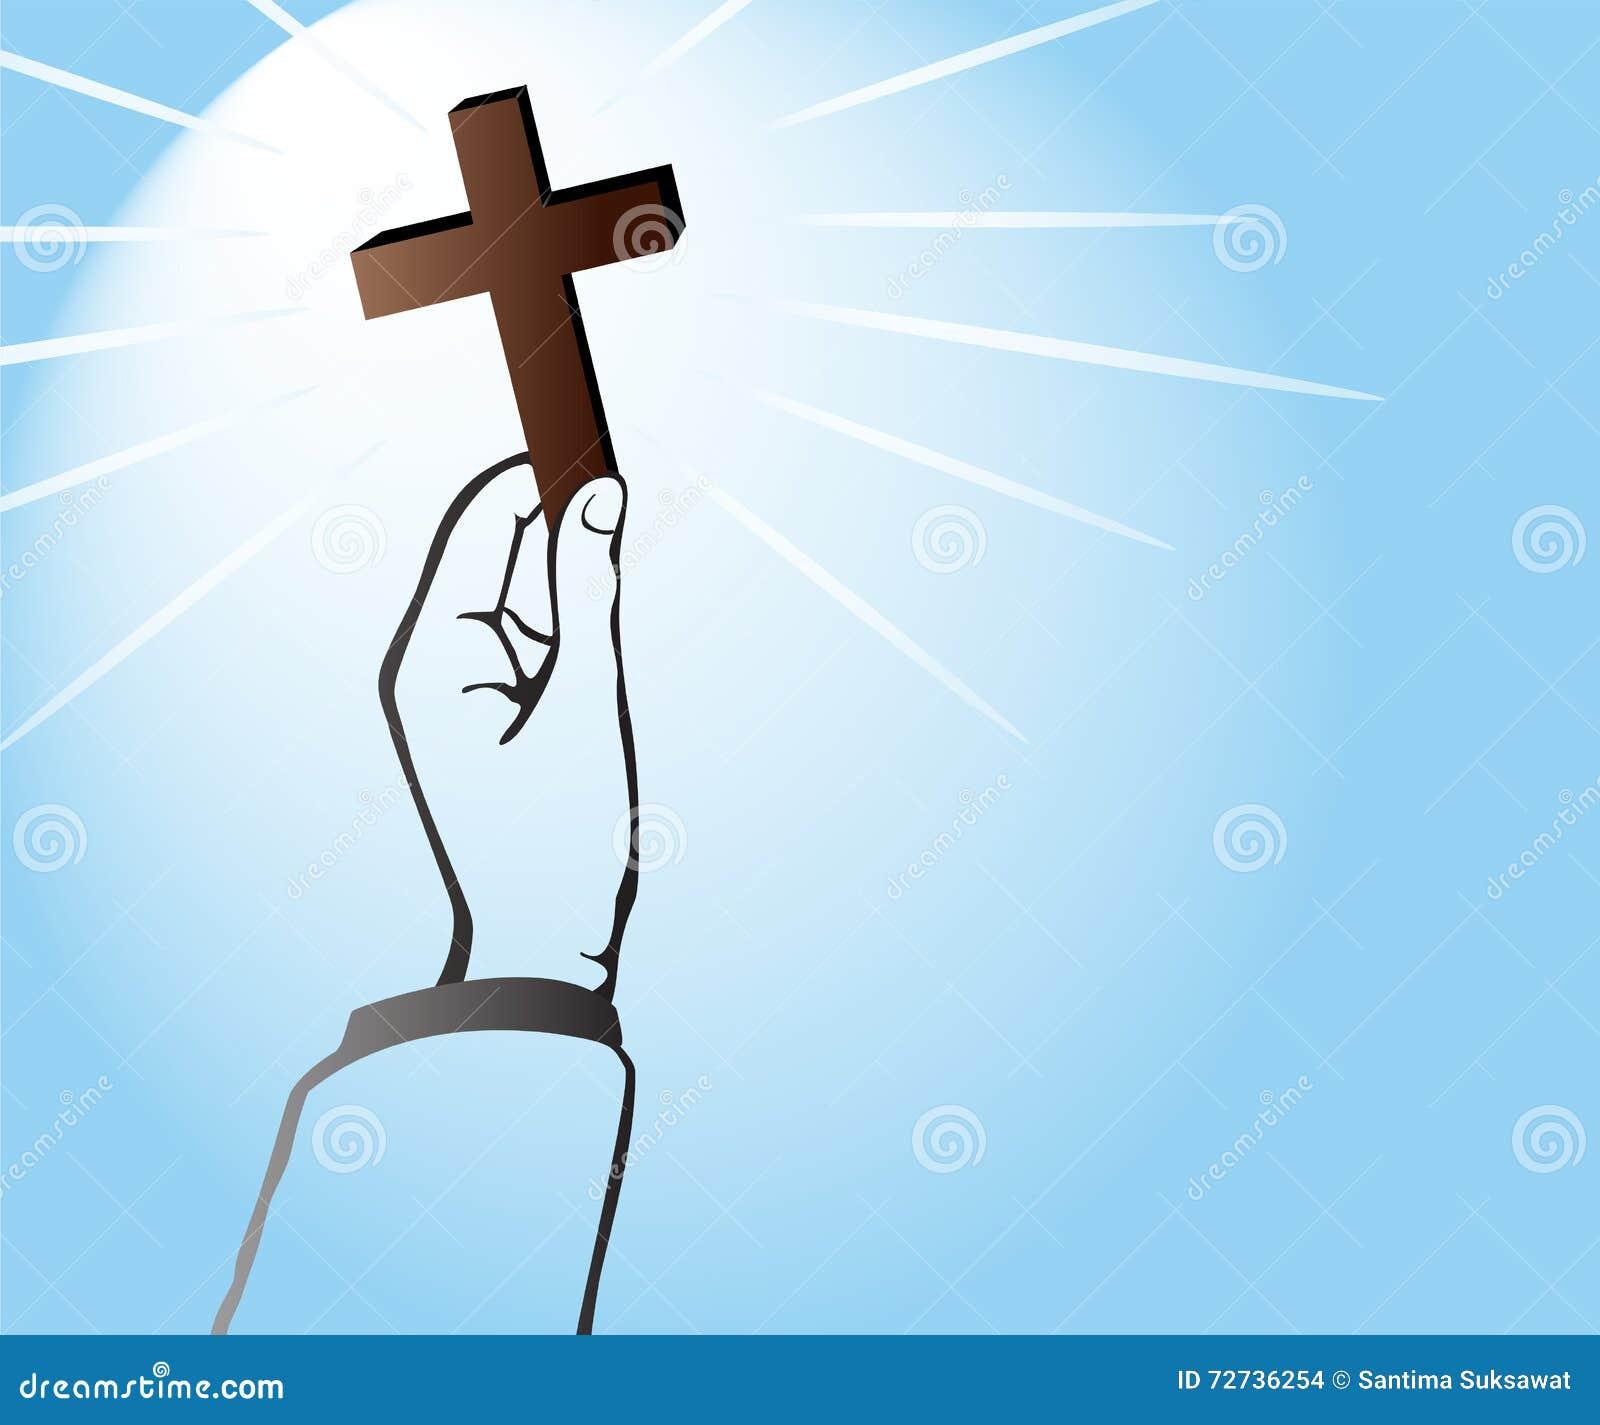 holy communion  eps cartoon vector cartoondealer com 1370717 maundy thursday clipart images maundy thursday clipart /quotes